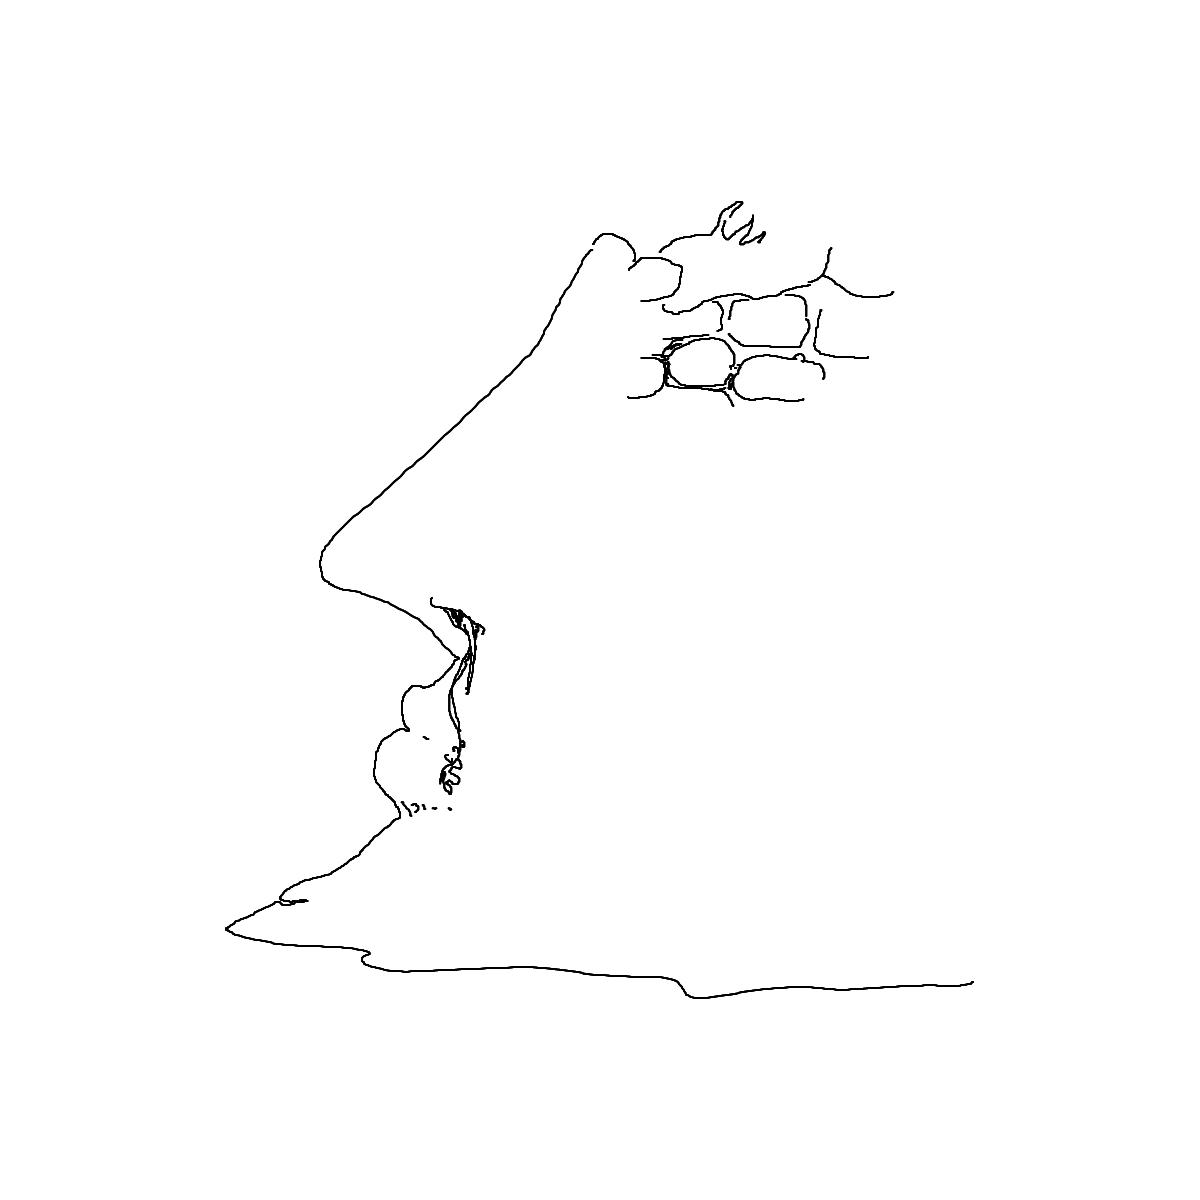 BAAAM drawing#8669 lat:78.4205322265625000lng: -4.4853219985961910